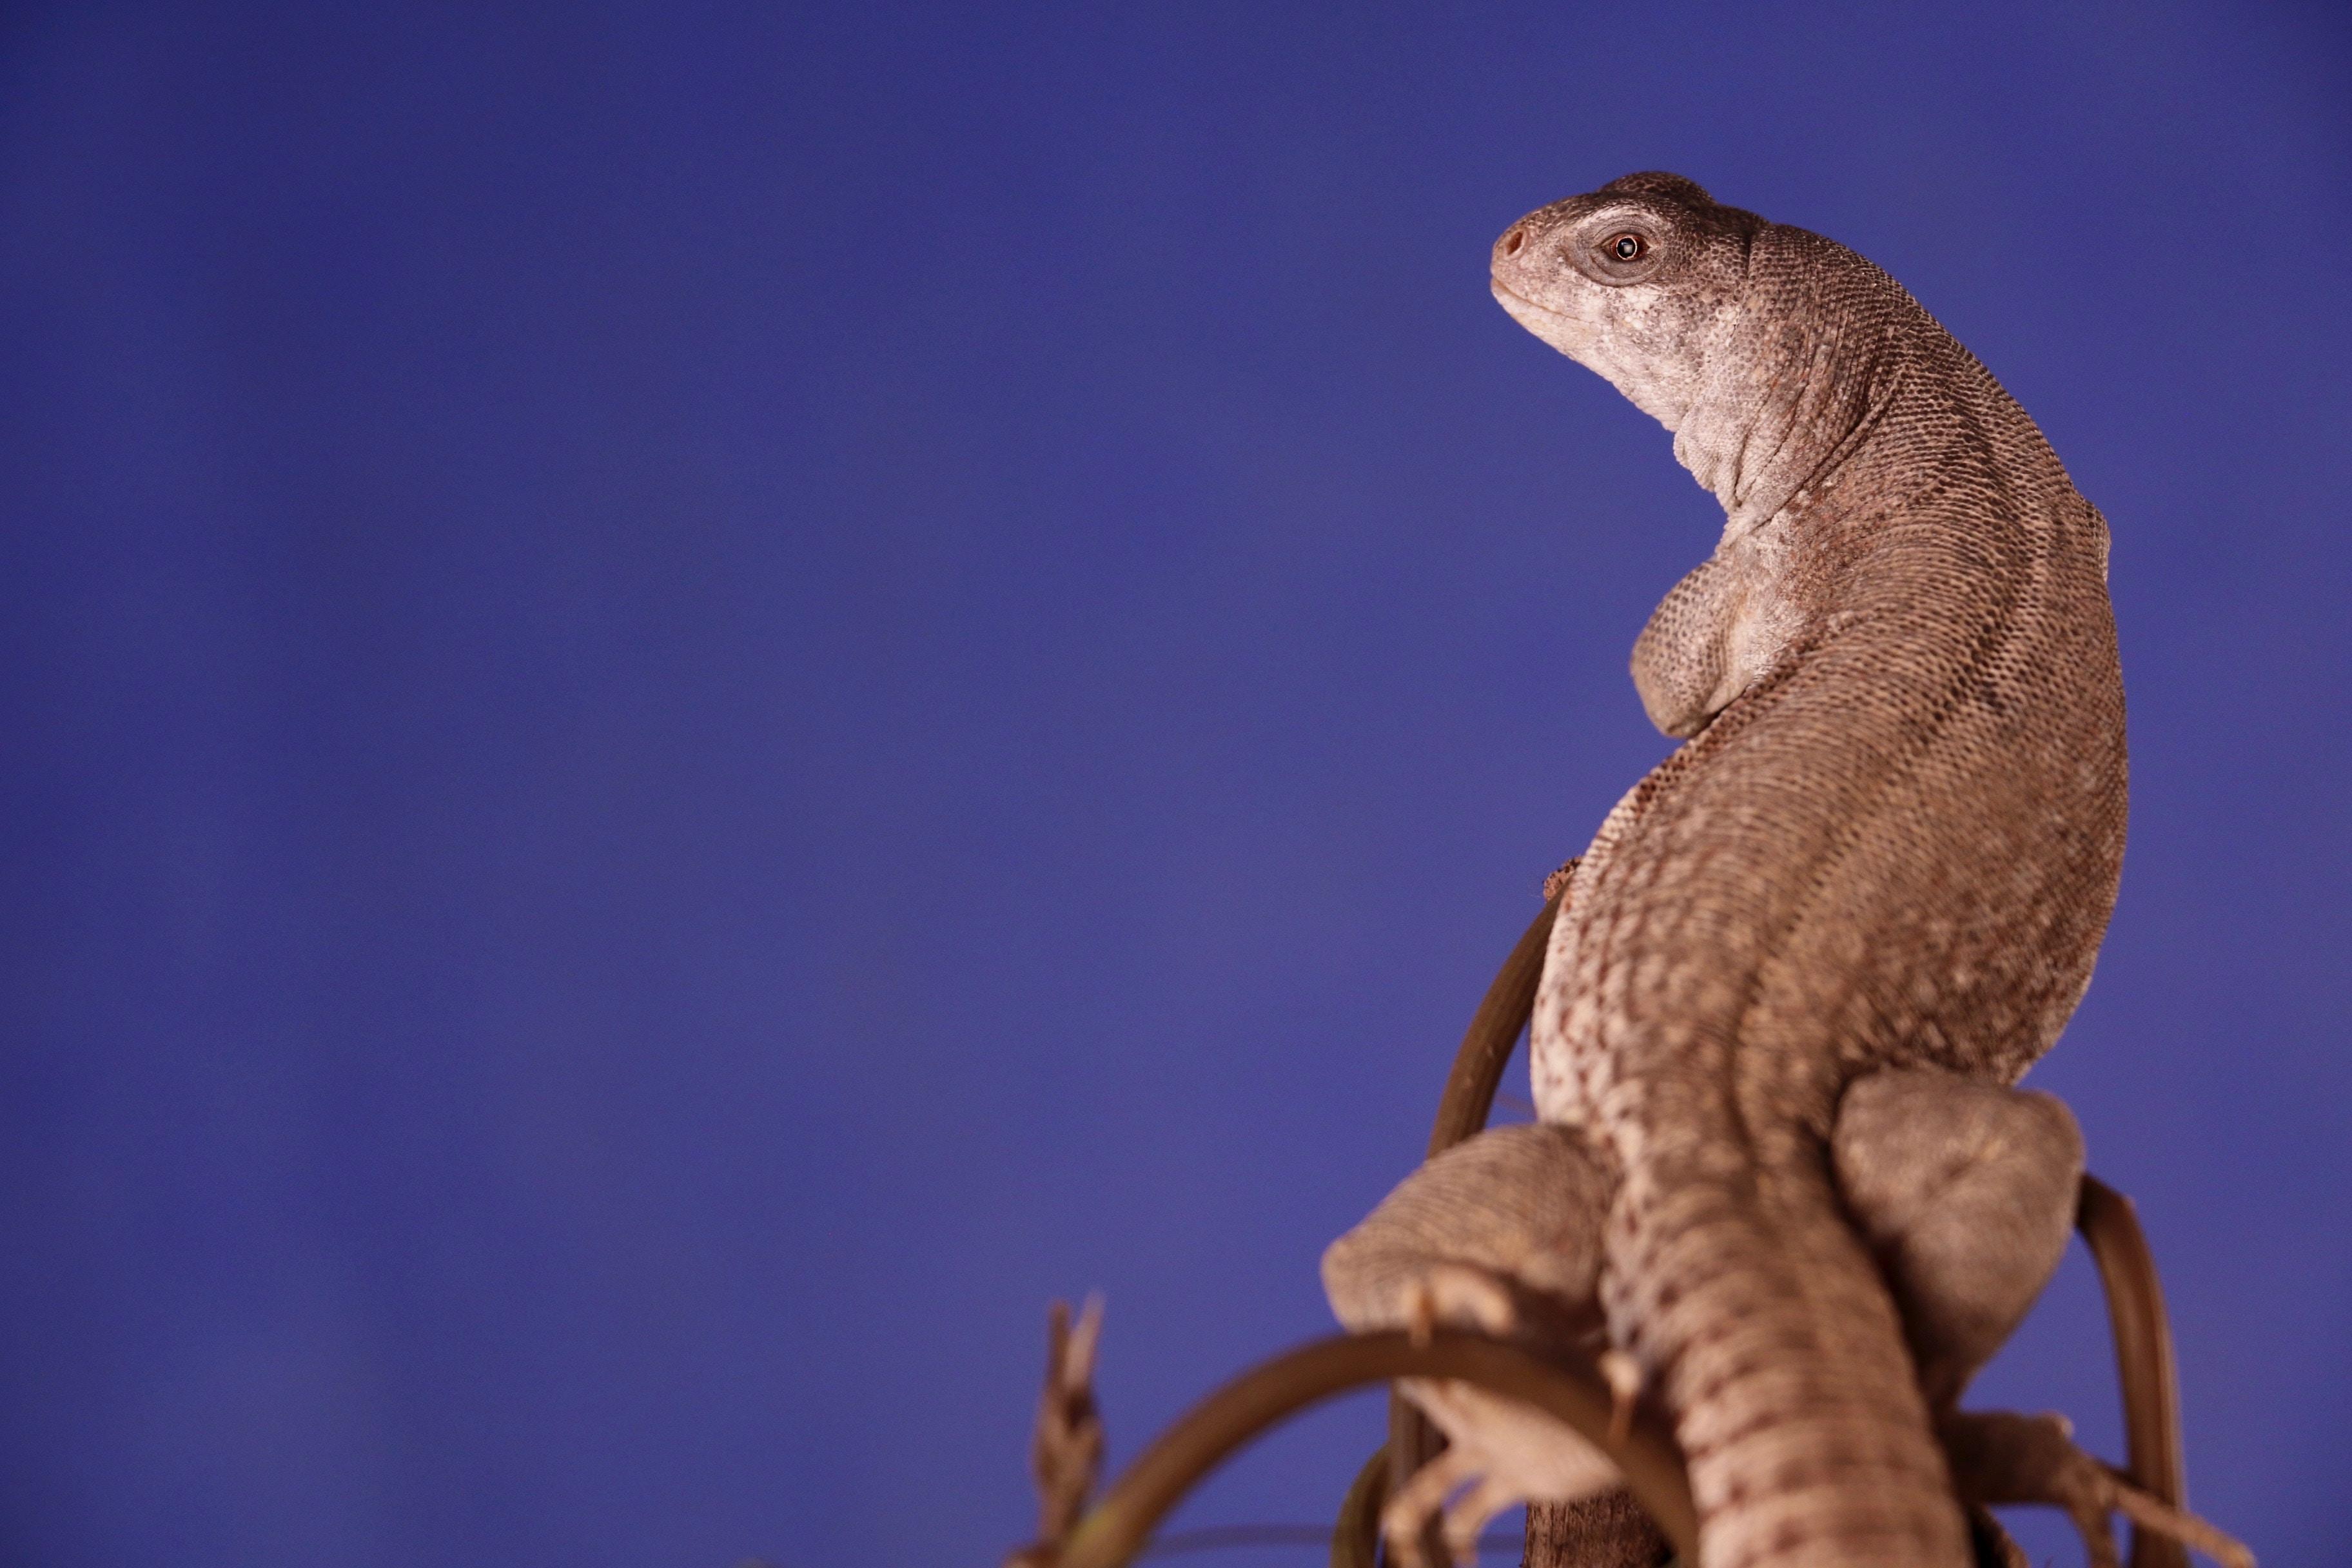 closeup photo of gray lizard